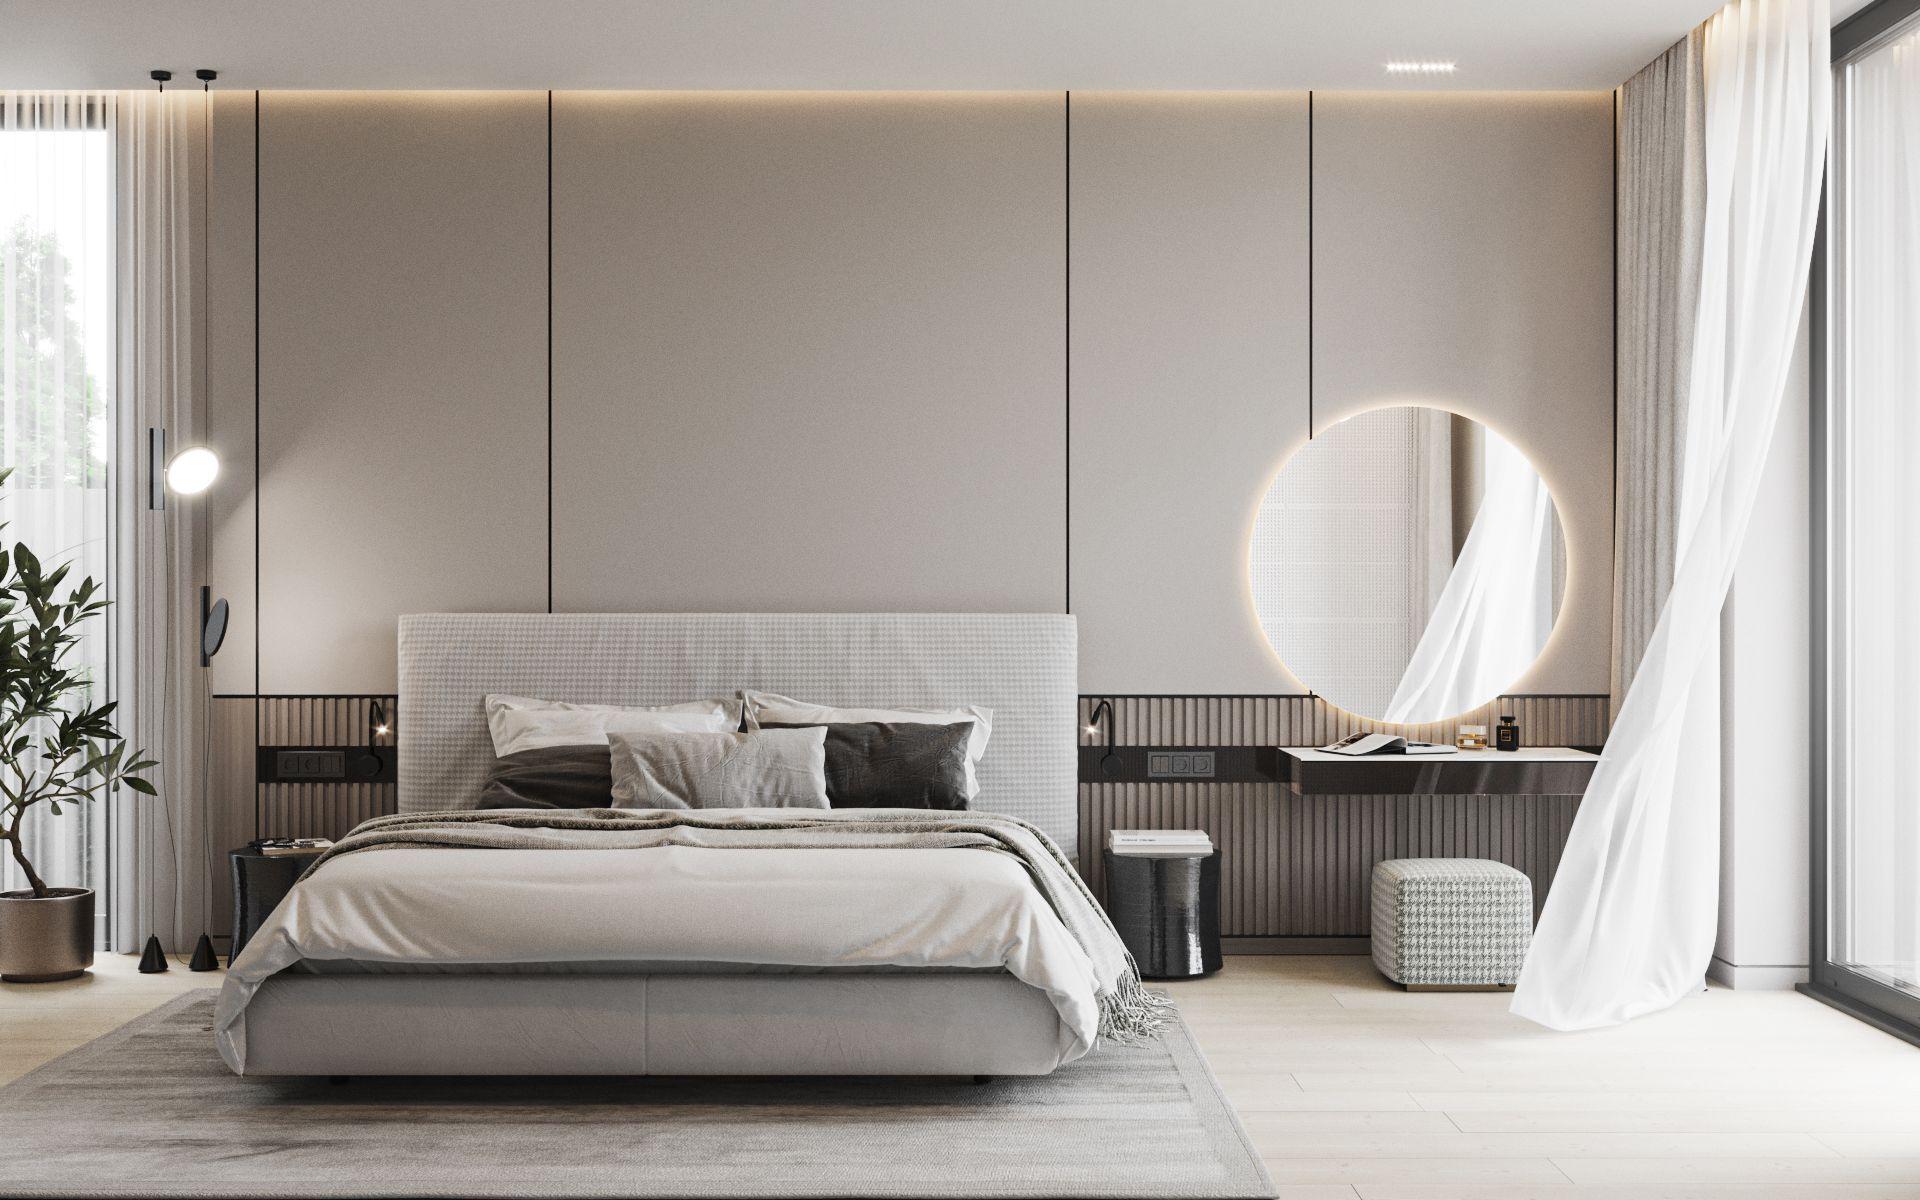 Interior Architecture Rational Interior Design By Dezest Modern Bedroom Interior Master Bedroom Interior Bedroom Interior